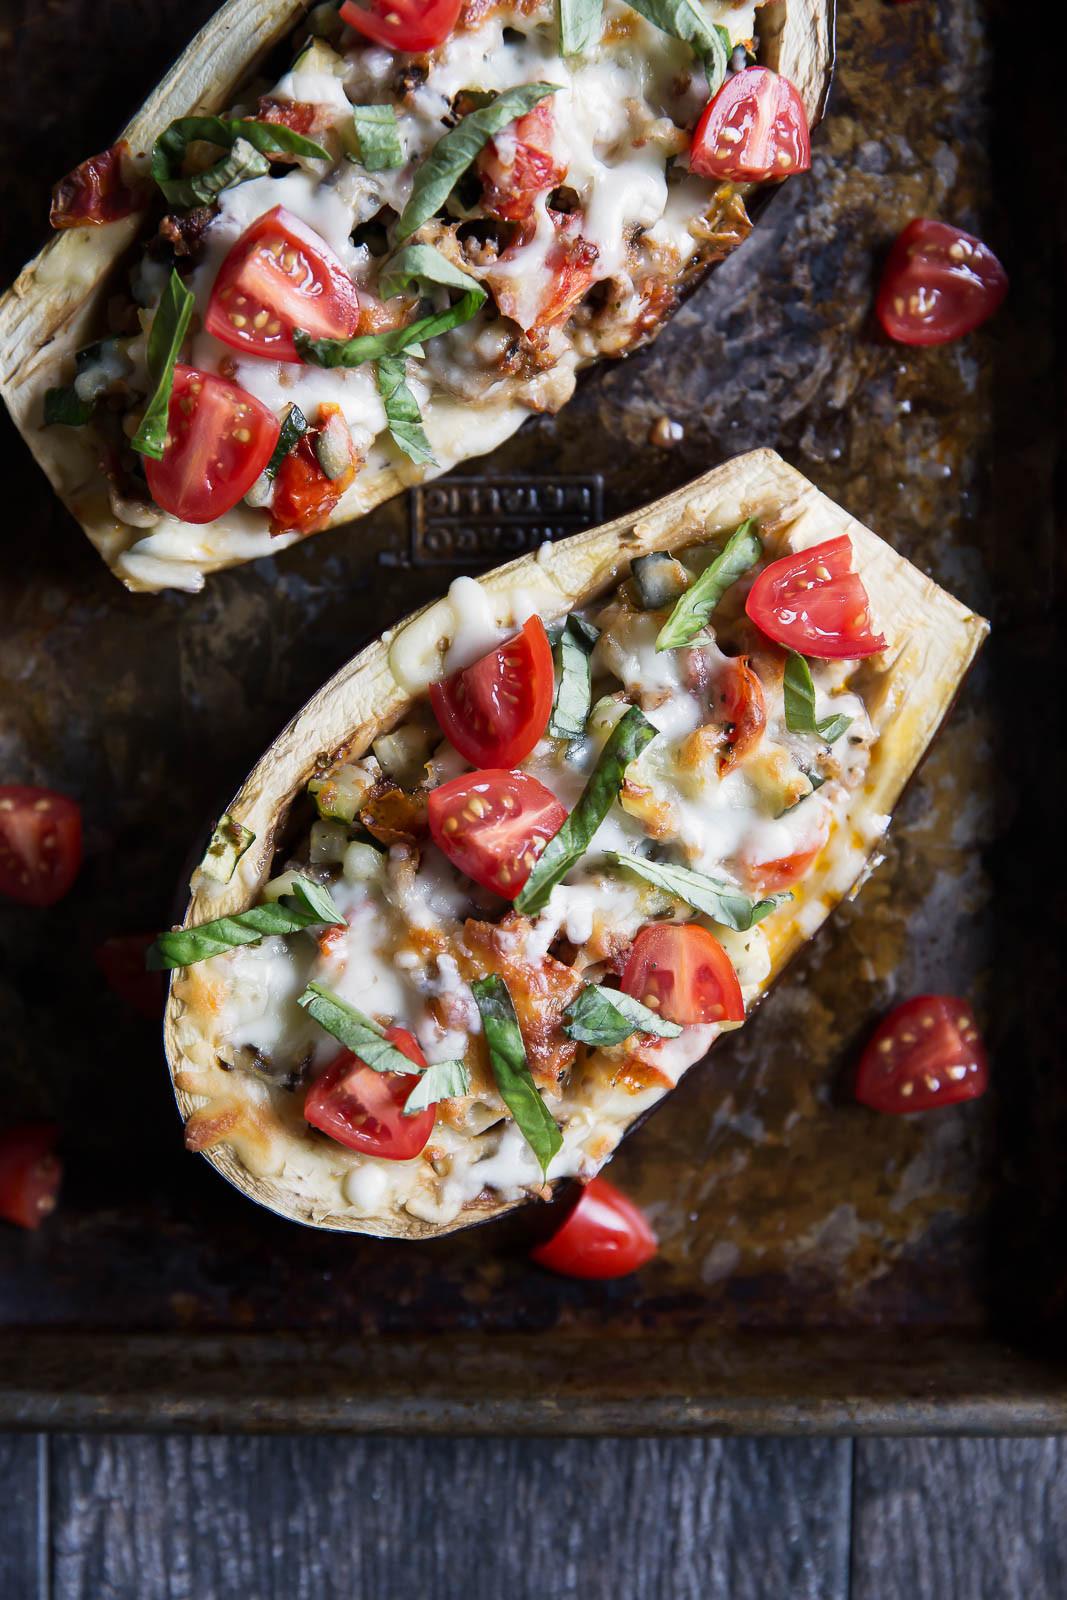 Eggplant Recipes Healthy  Julie's Stuffed Eggplant Boats